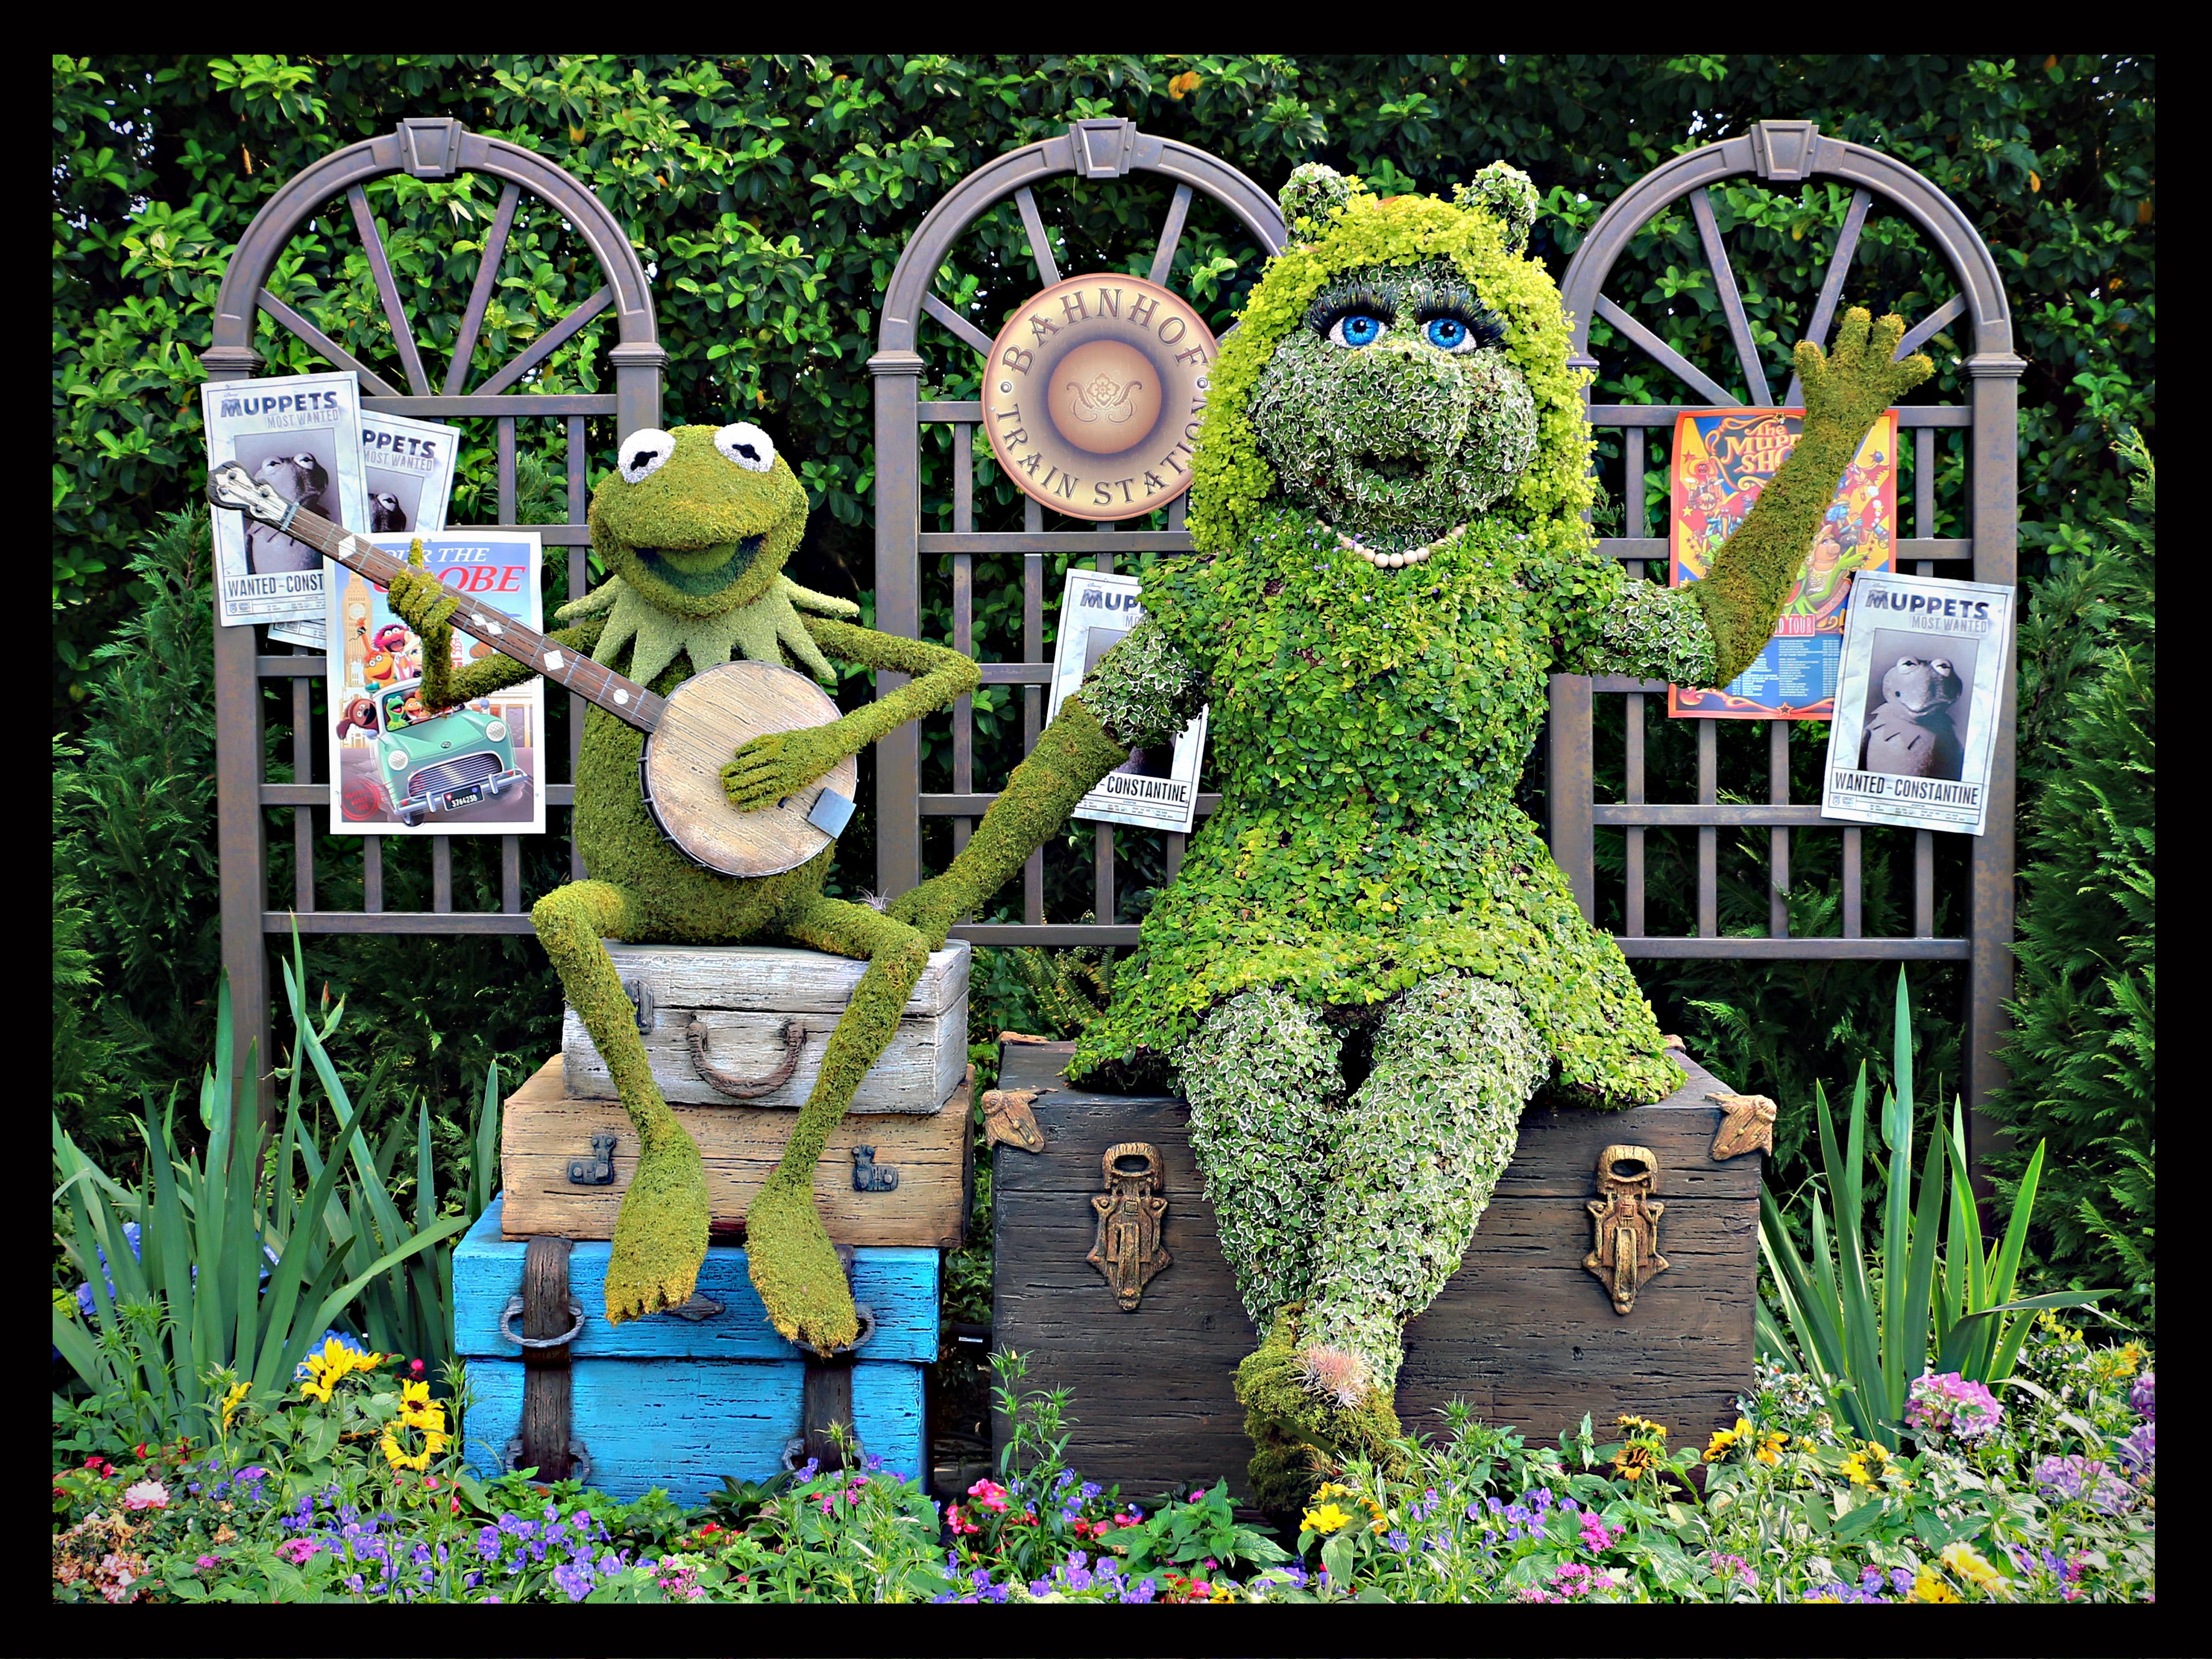 Wallpaper : Orlando, Epcot, topiary, Florida, muppets